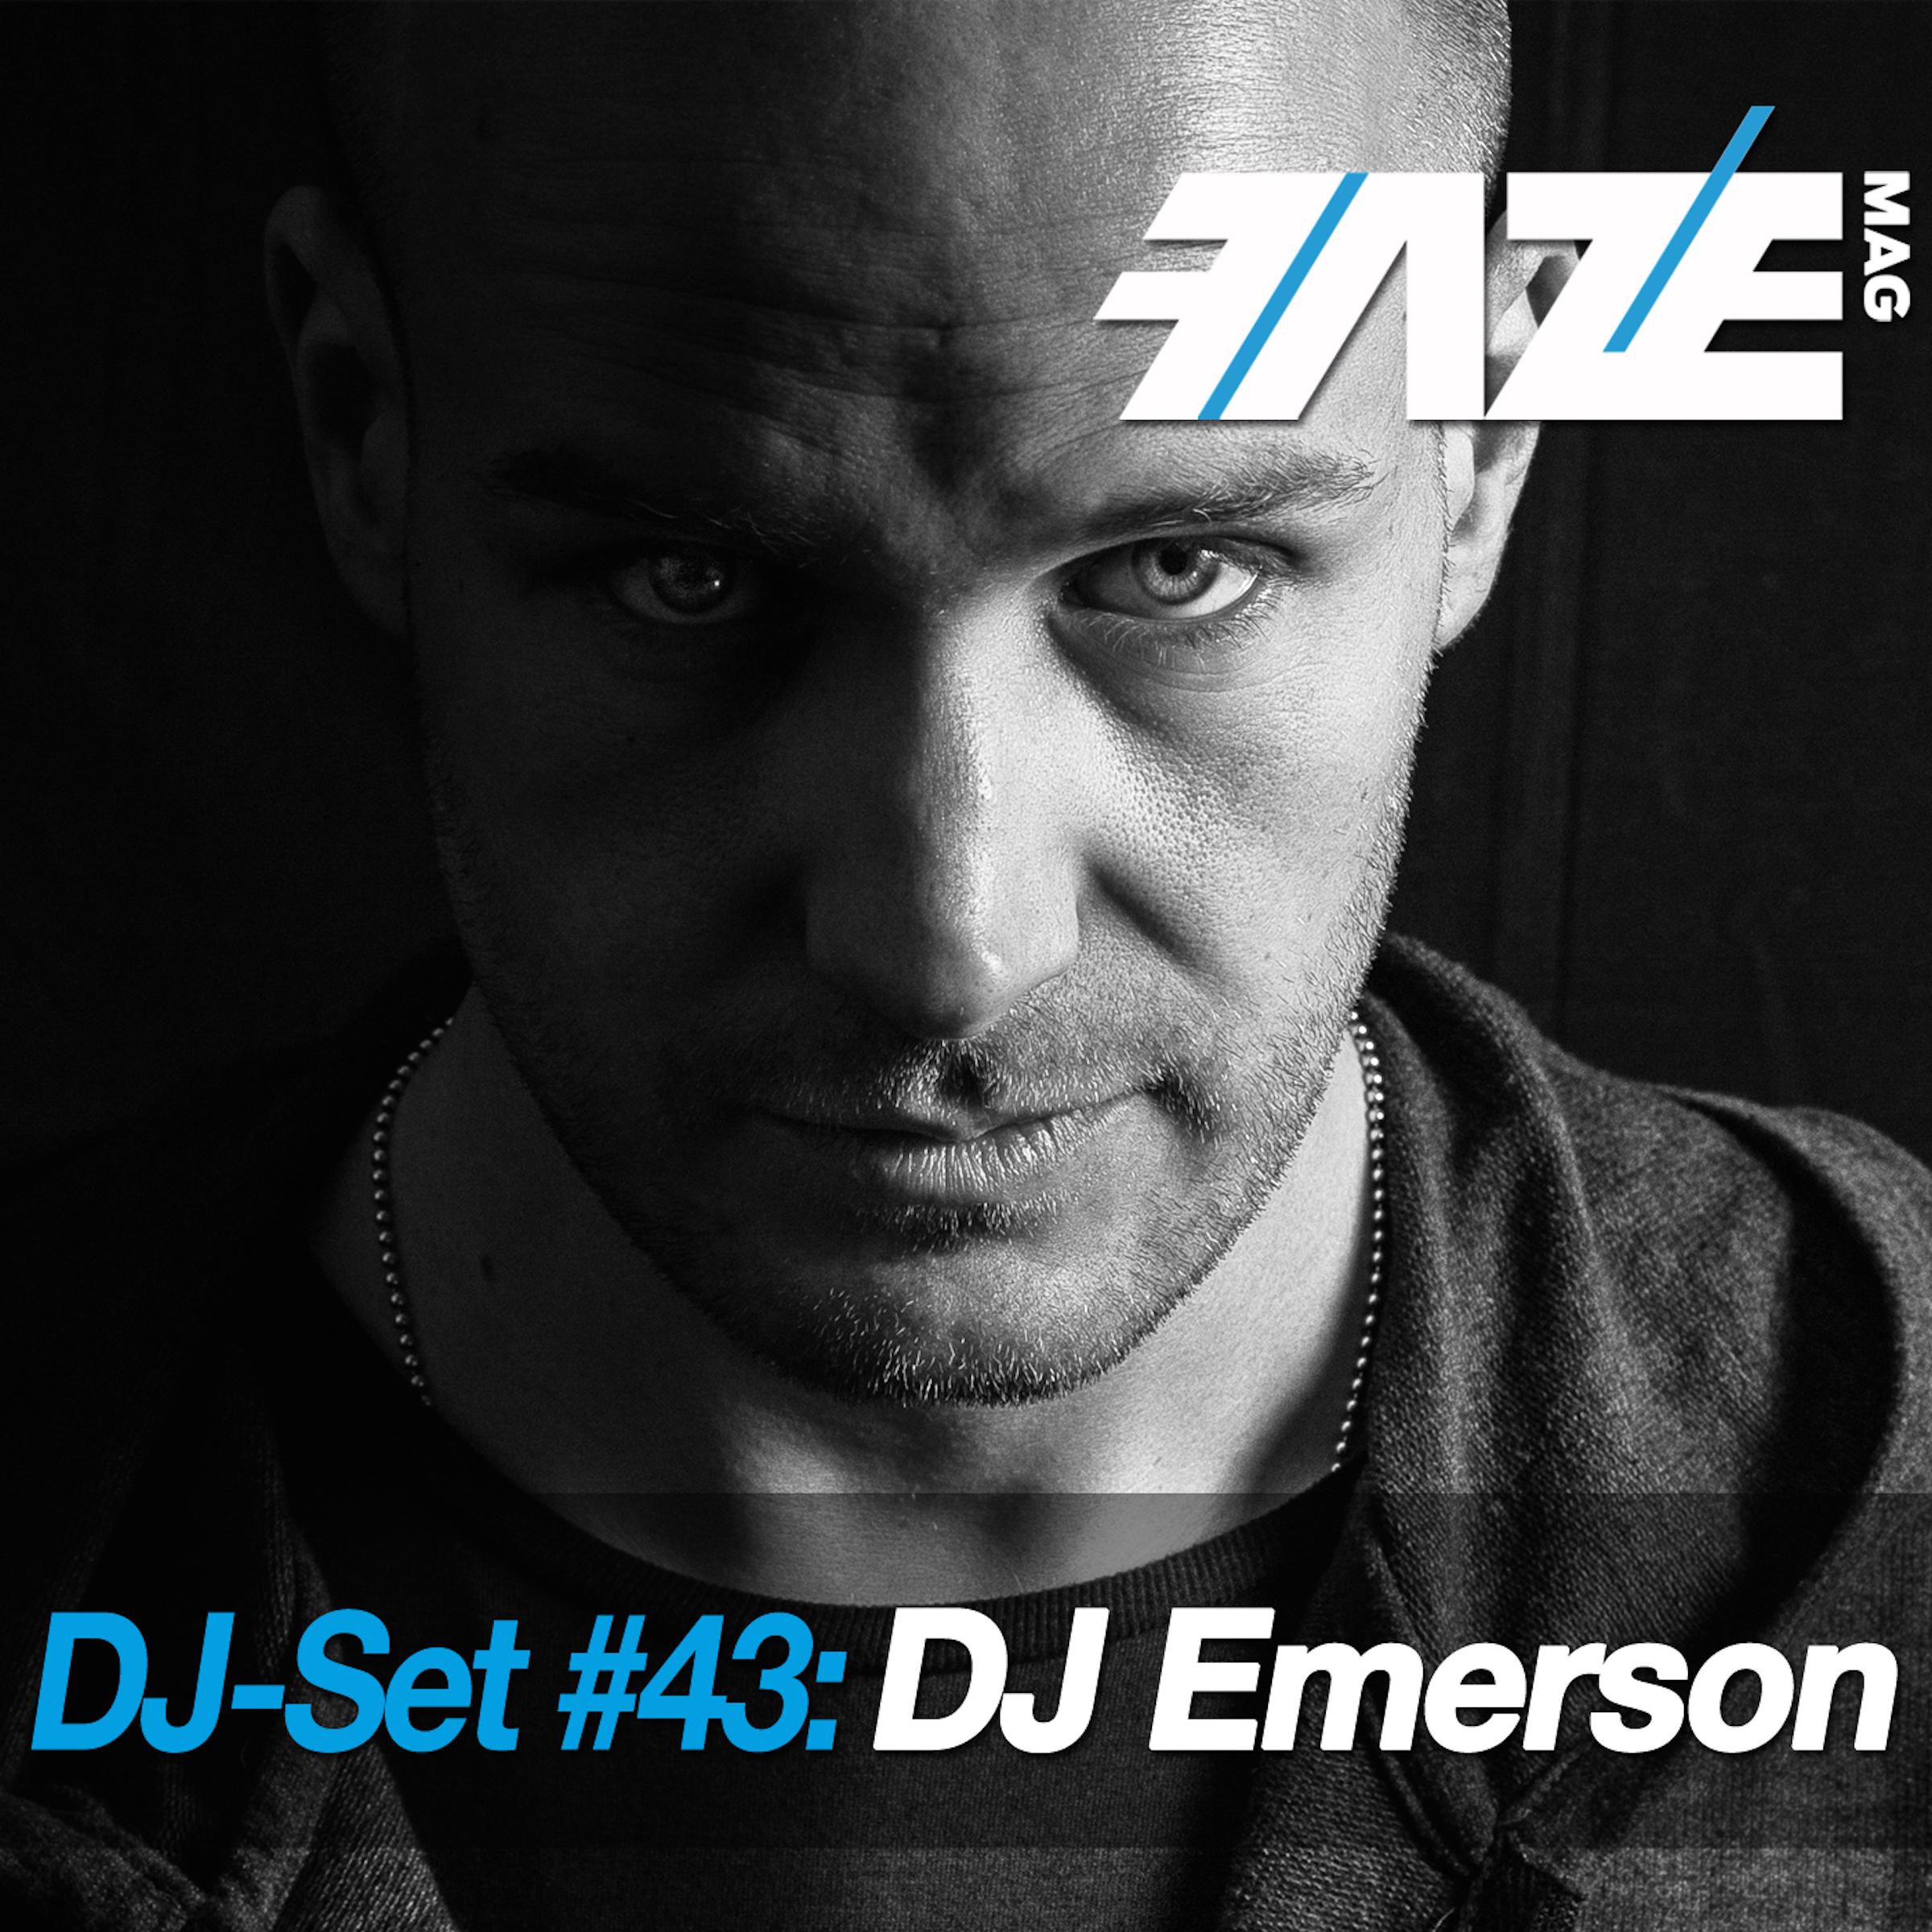 FAZEmag DJ-Set #43: DJ Emerson – exklusiv bei iTunes